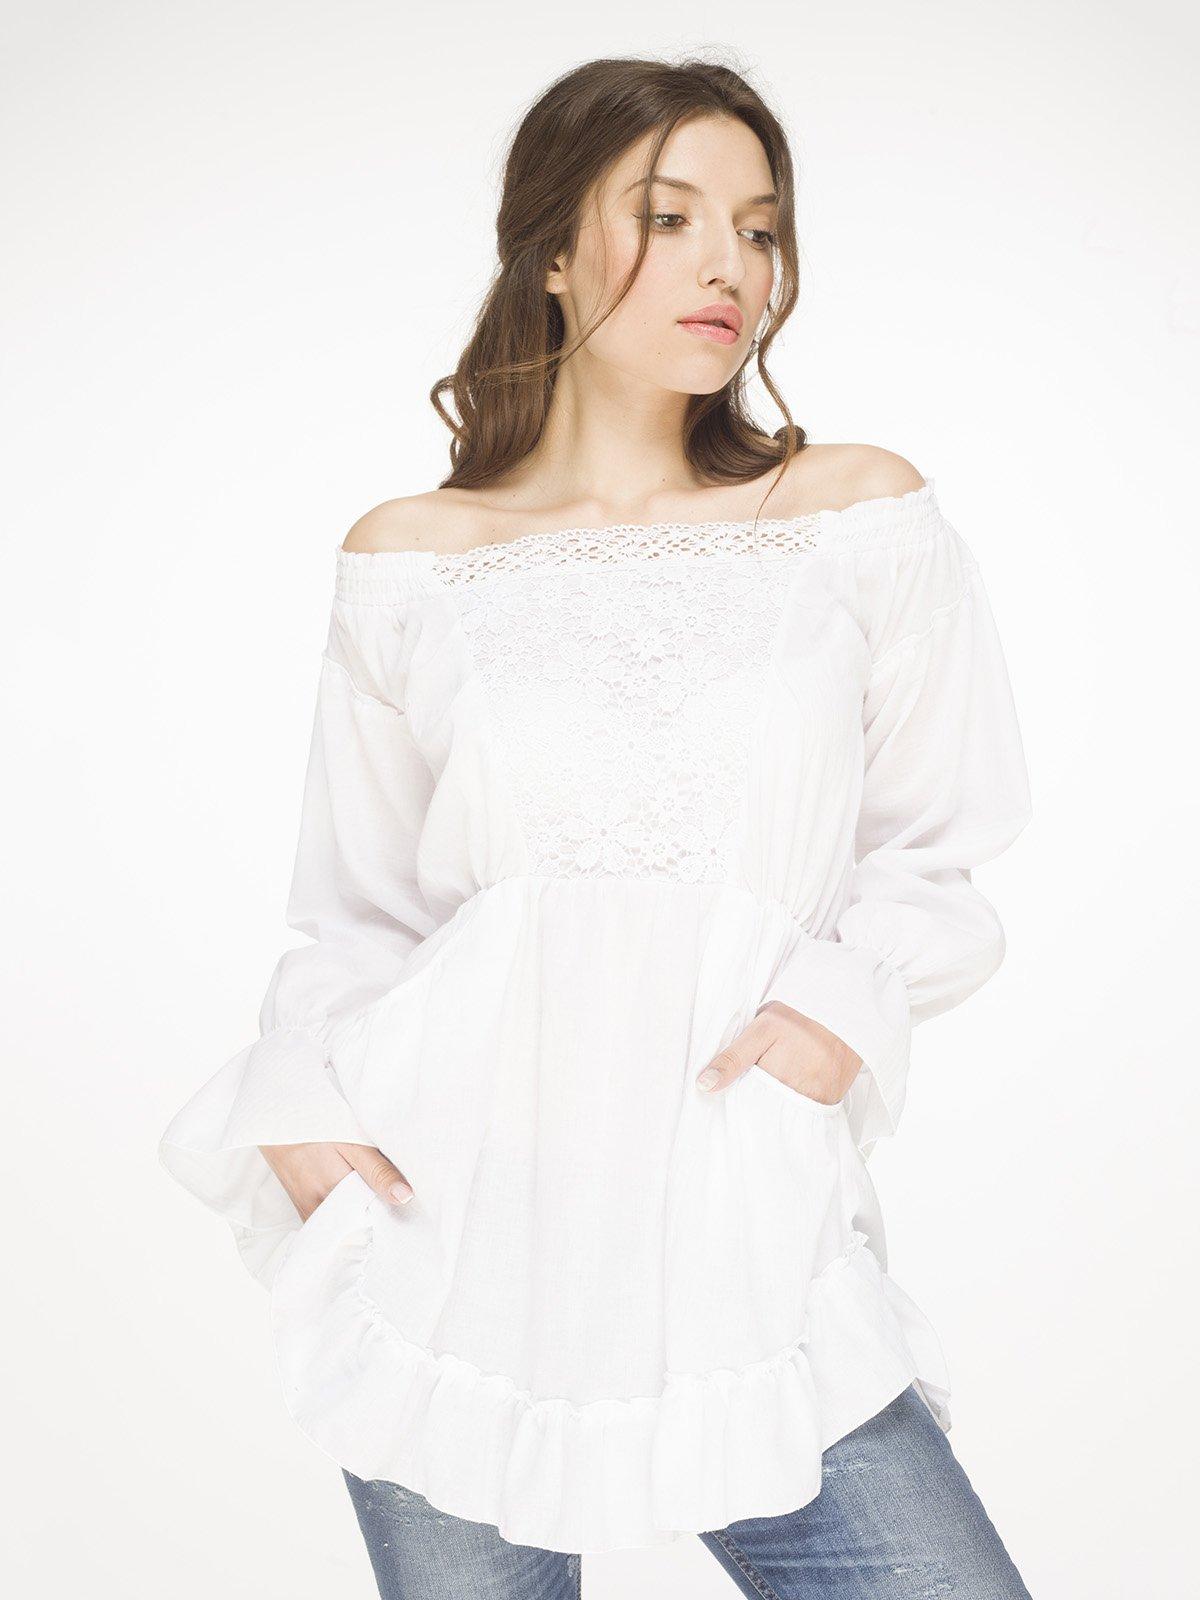 ad996f4378a Туника белая с кружевом — Arefeva